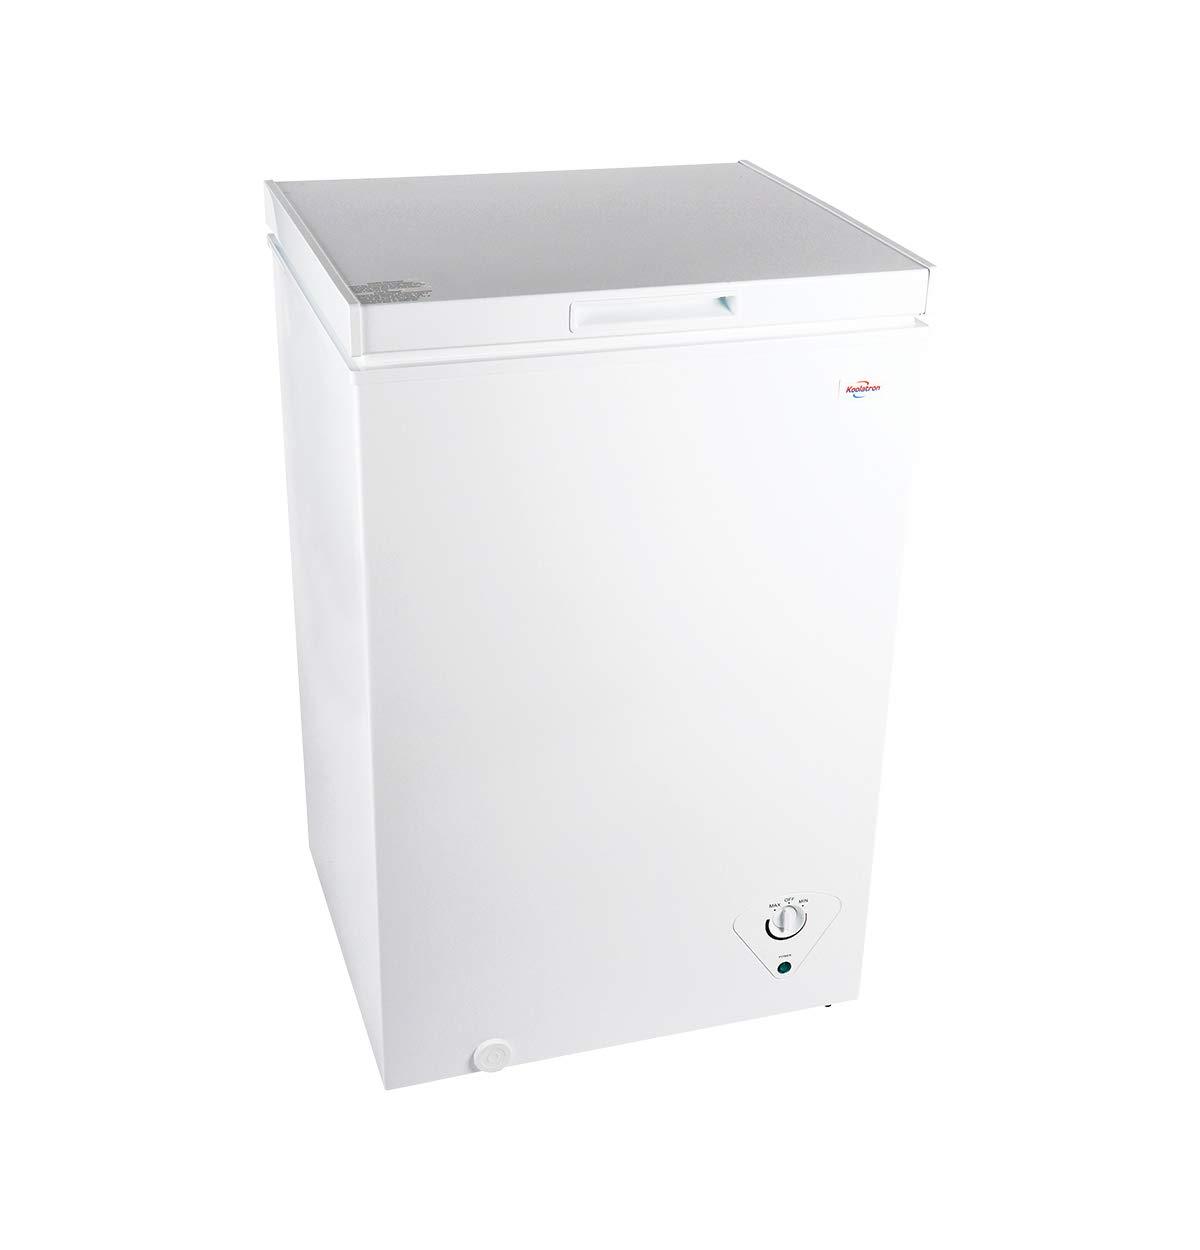 Koolatron KTCF99 3.5 Cubic Foot (99 Liters) Chest Freezer with Adjustable Thermostat